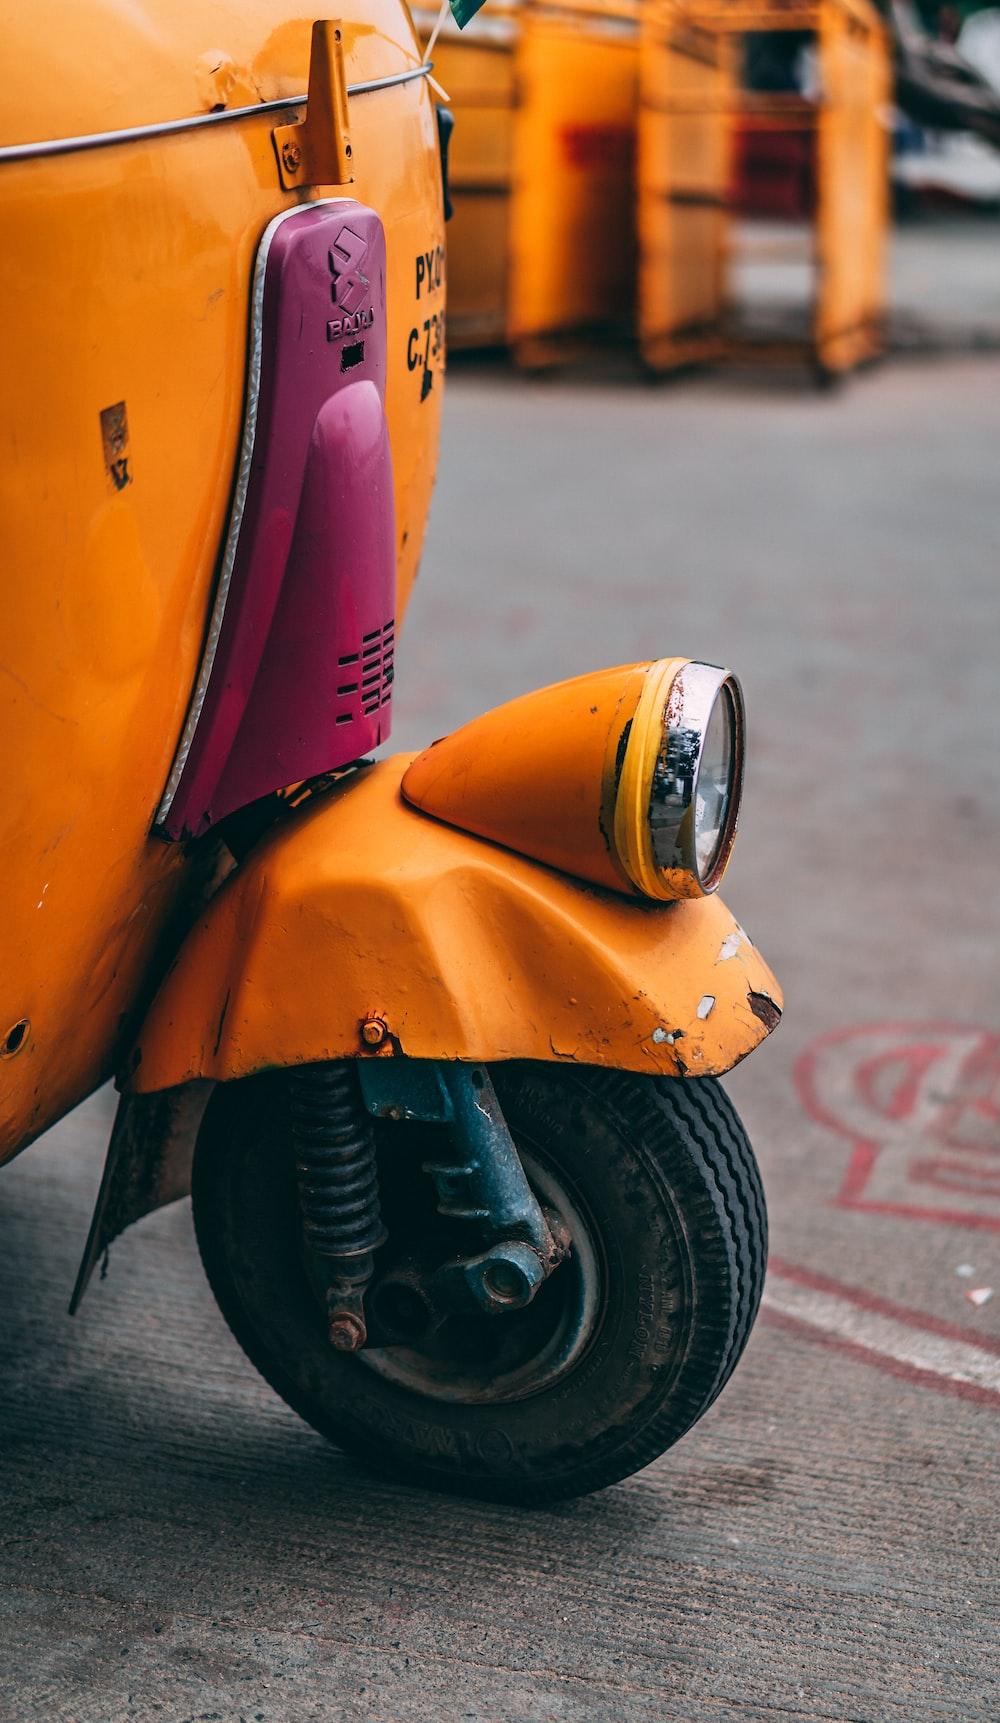 orange auto-rickshaw